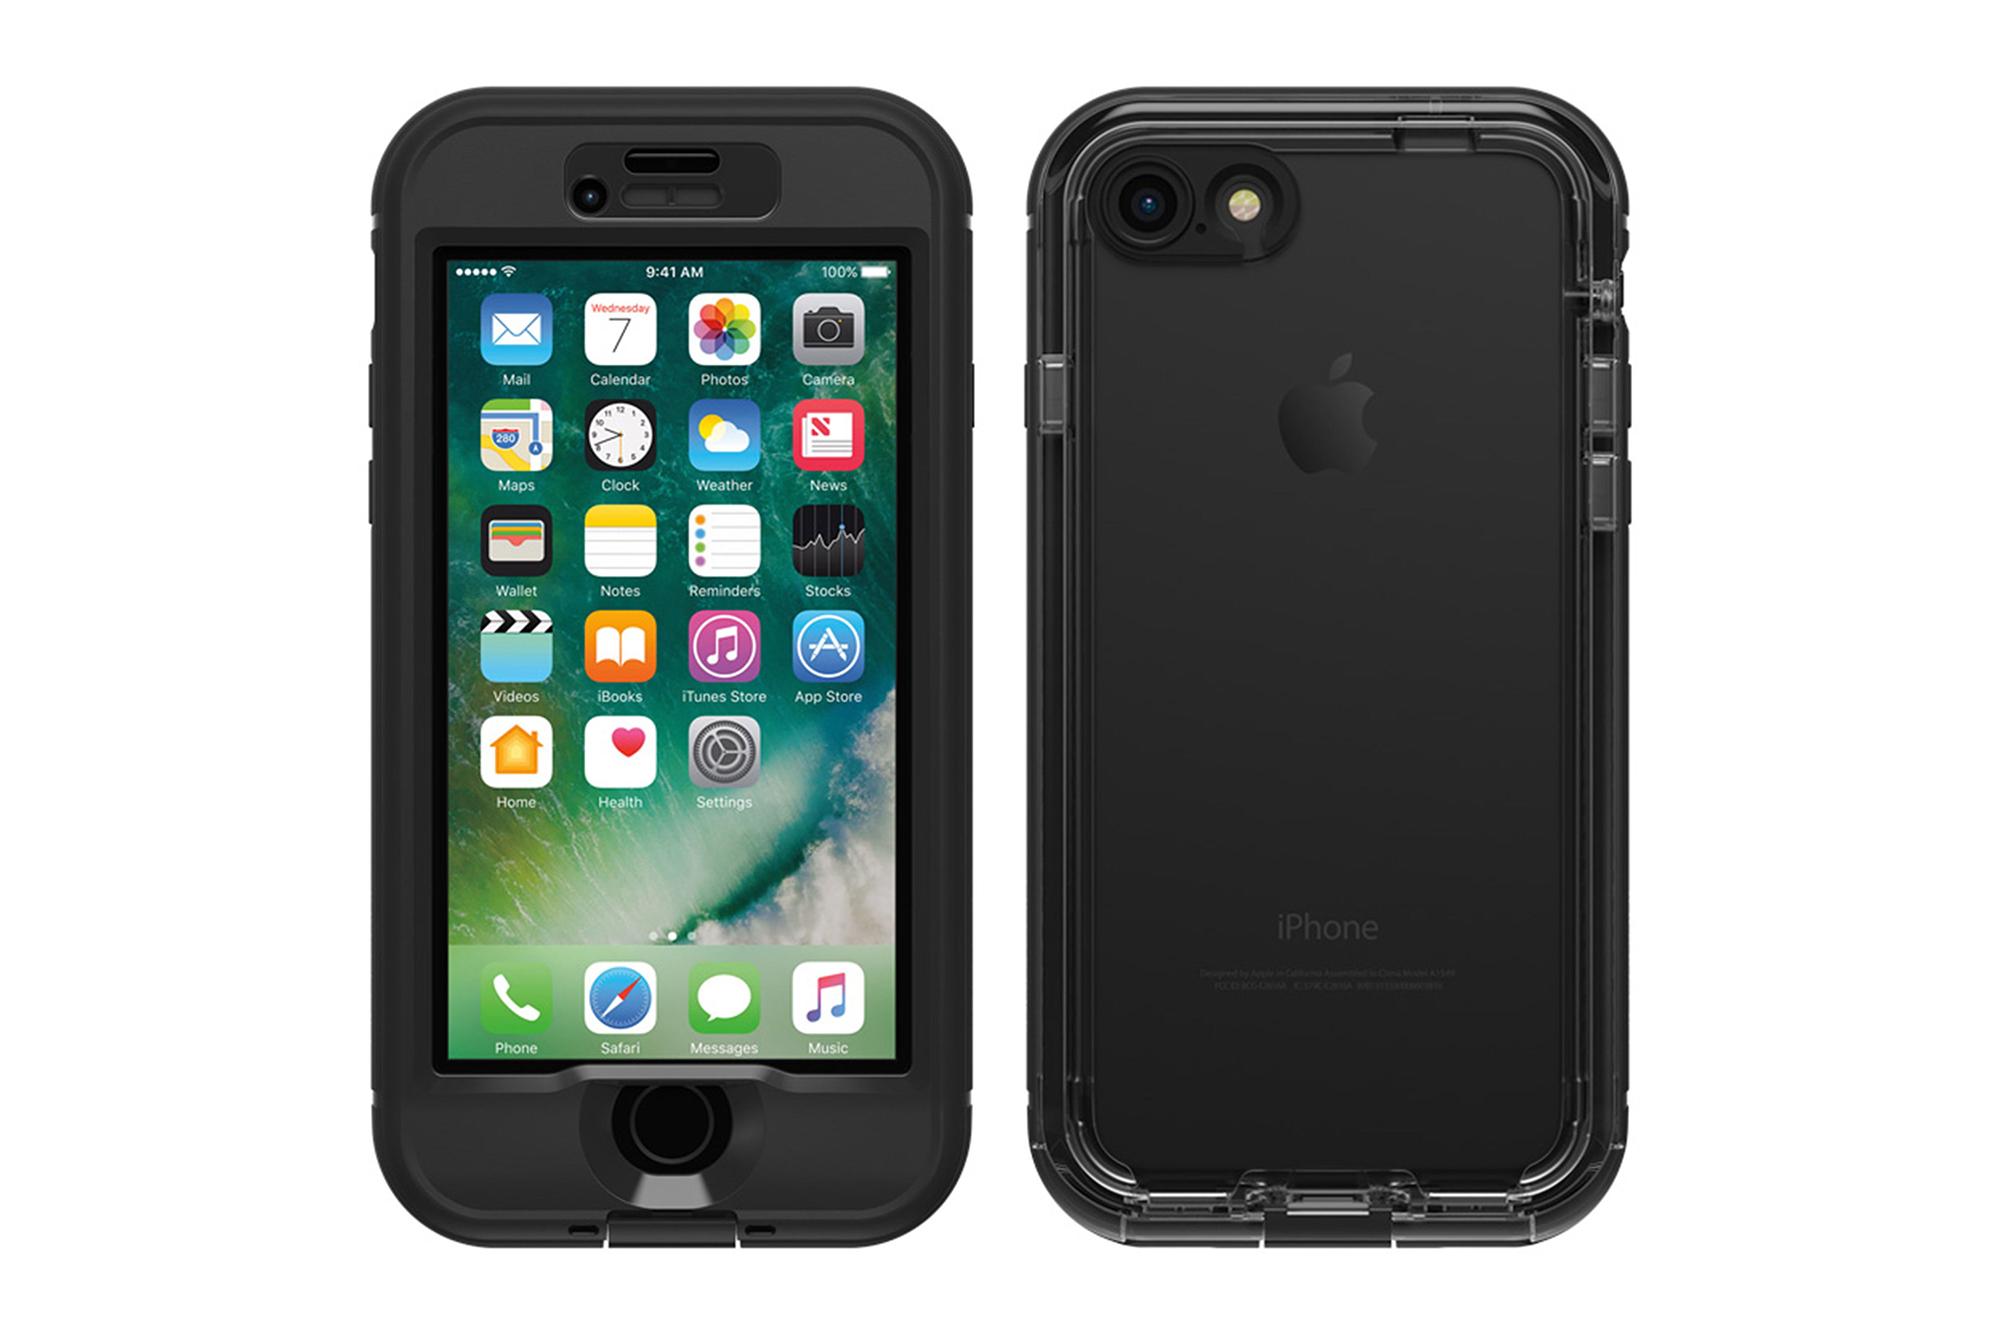 LifeProof, 내충격 iPhone 7 케이스 NUUD 발표